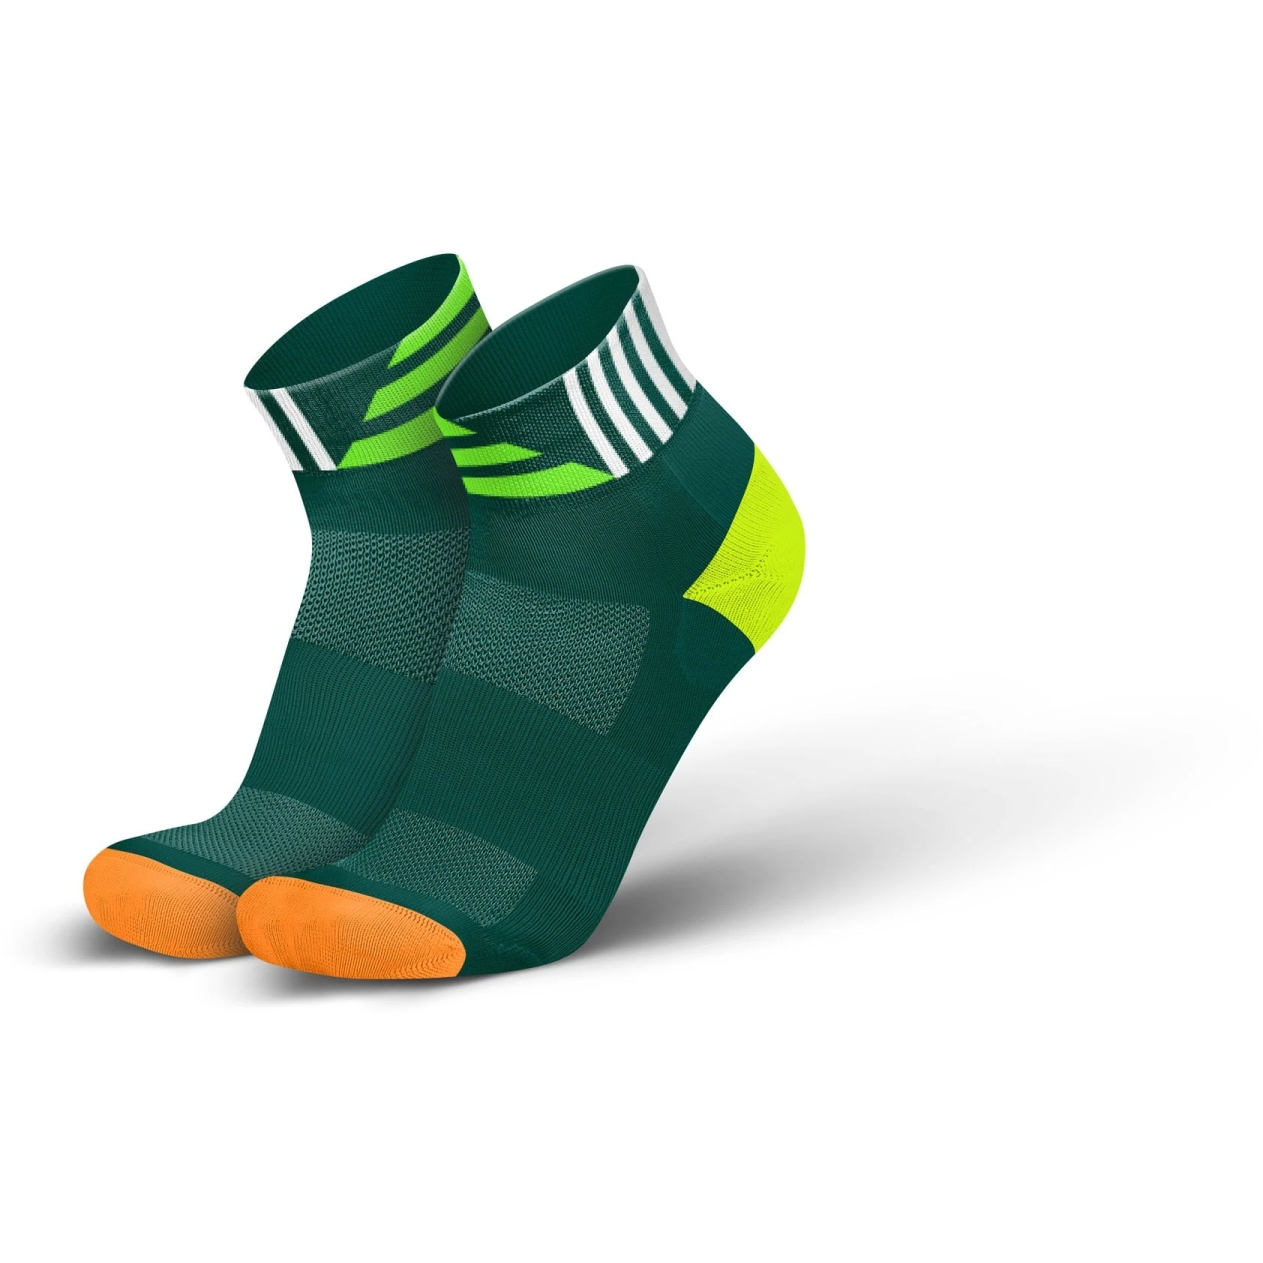 Produktbild von INCYLENCE Ultralight Contrasts Socken - Green